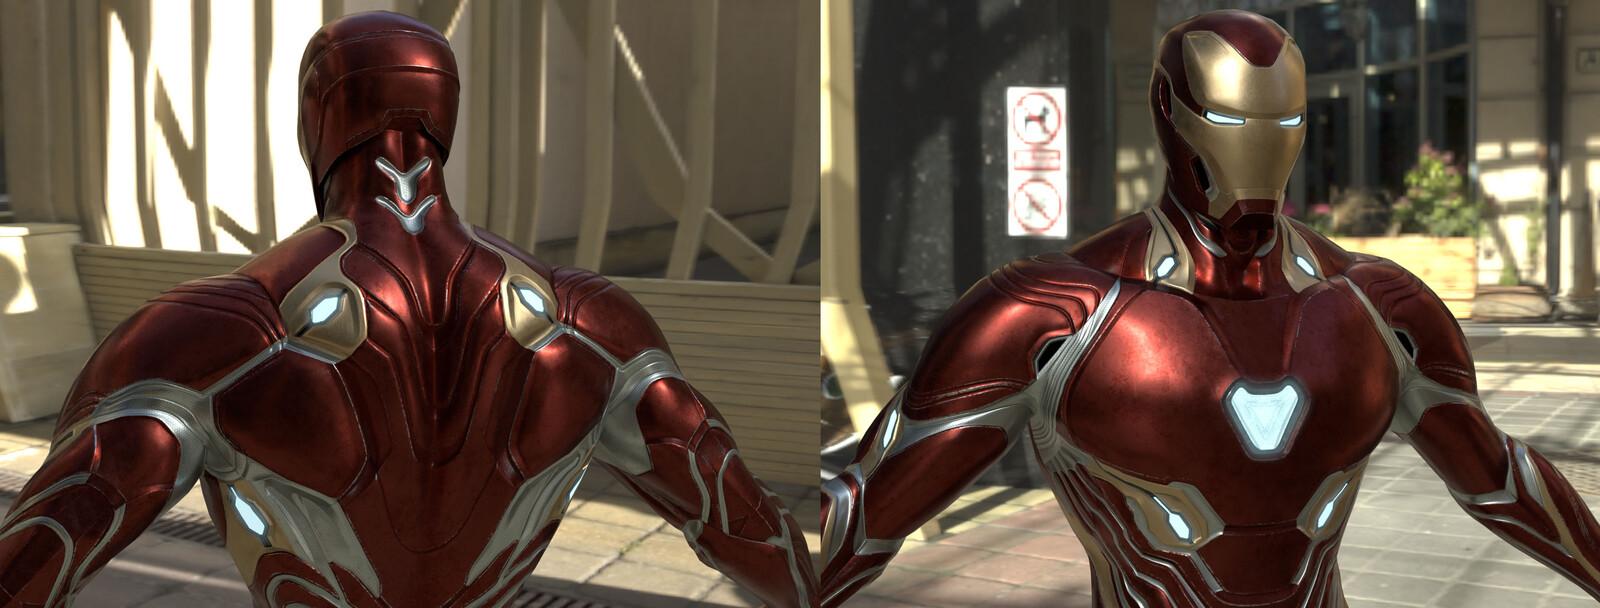 Ironman, Infinity War